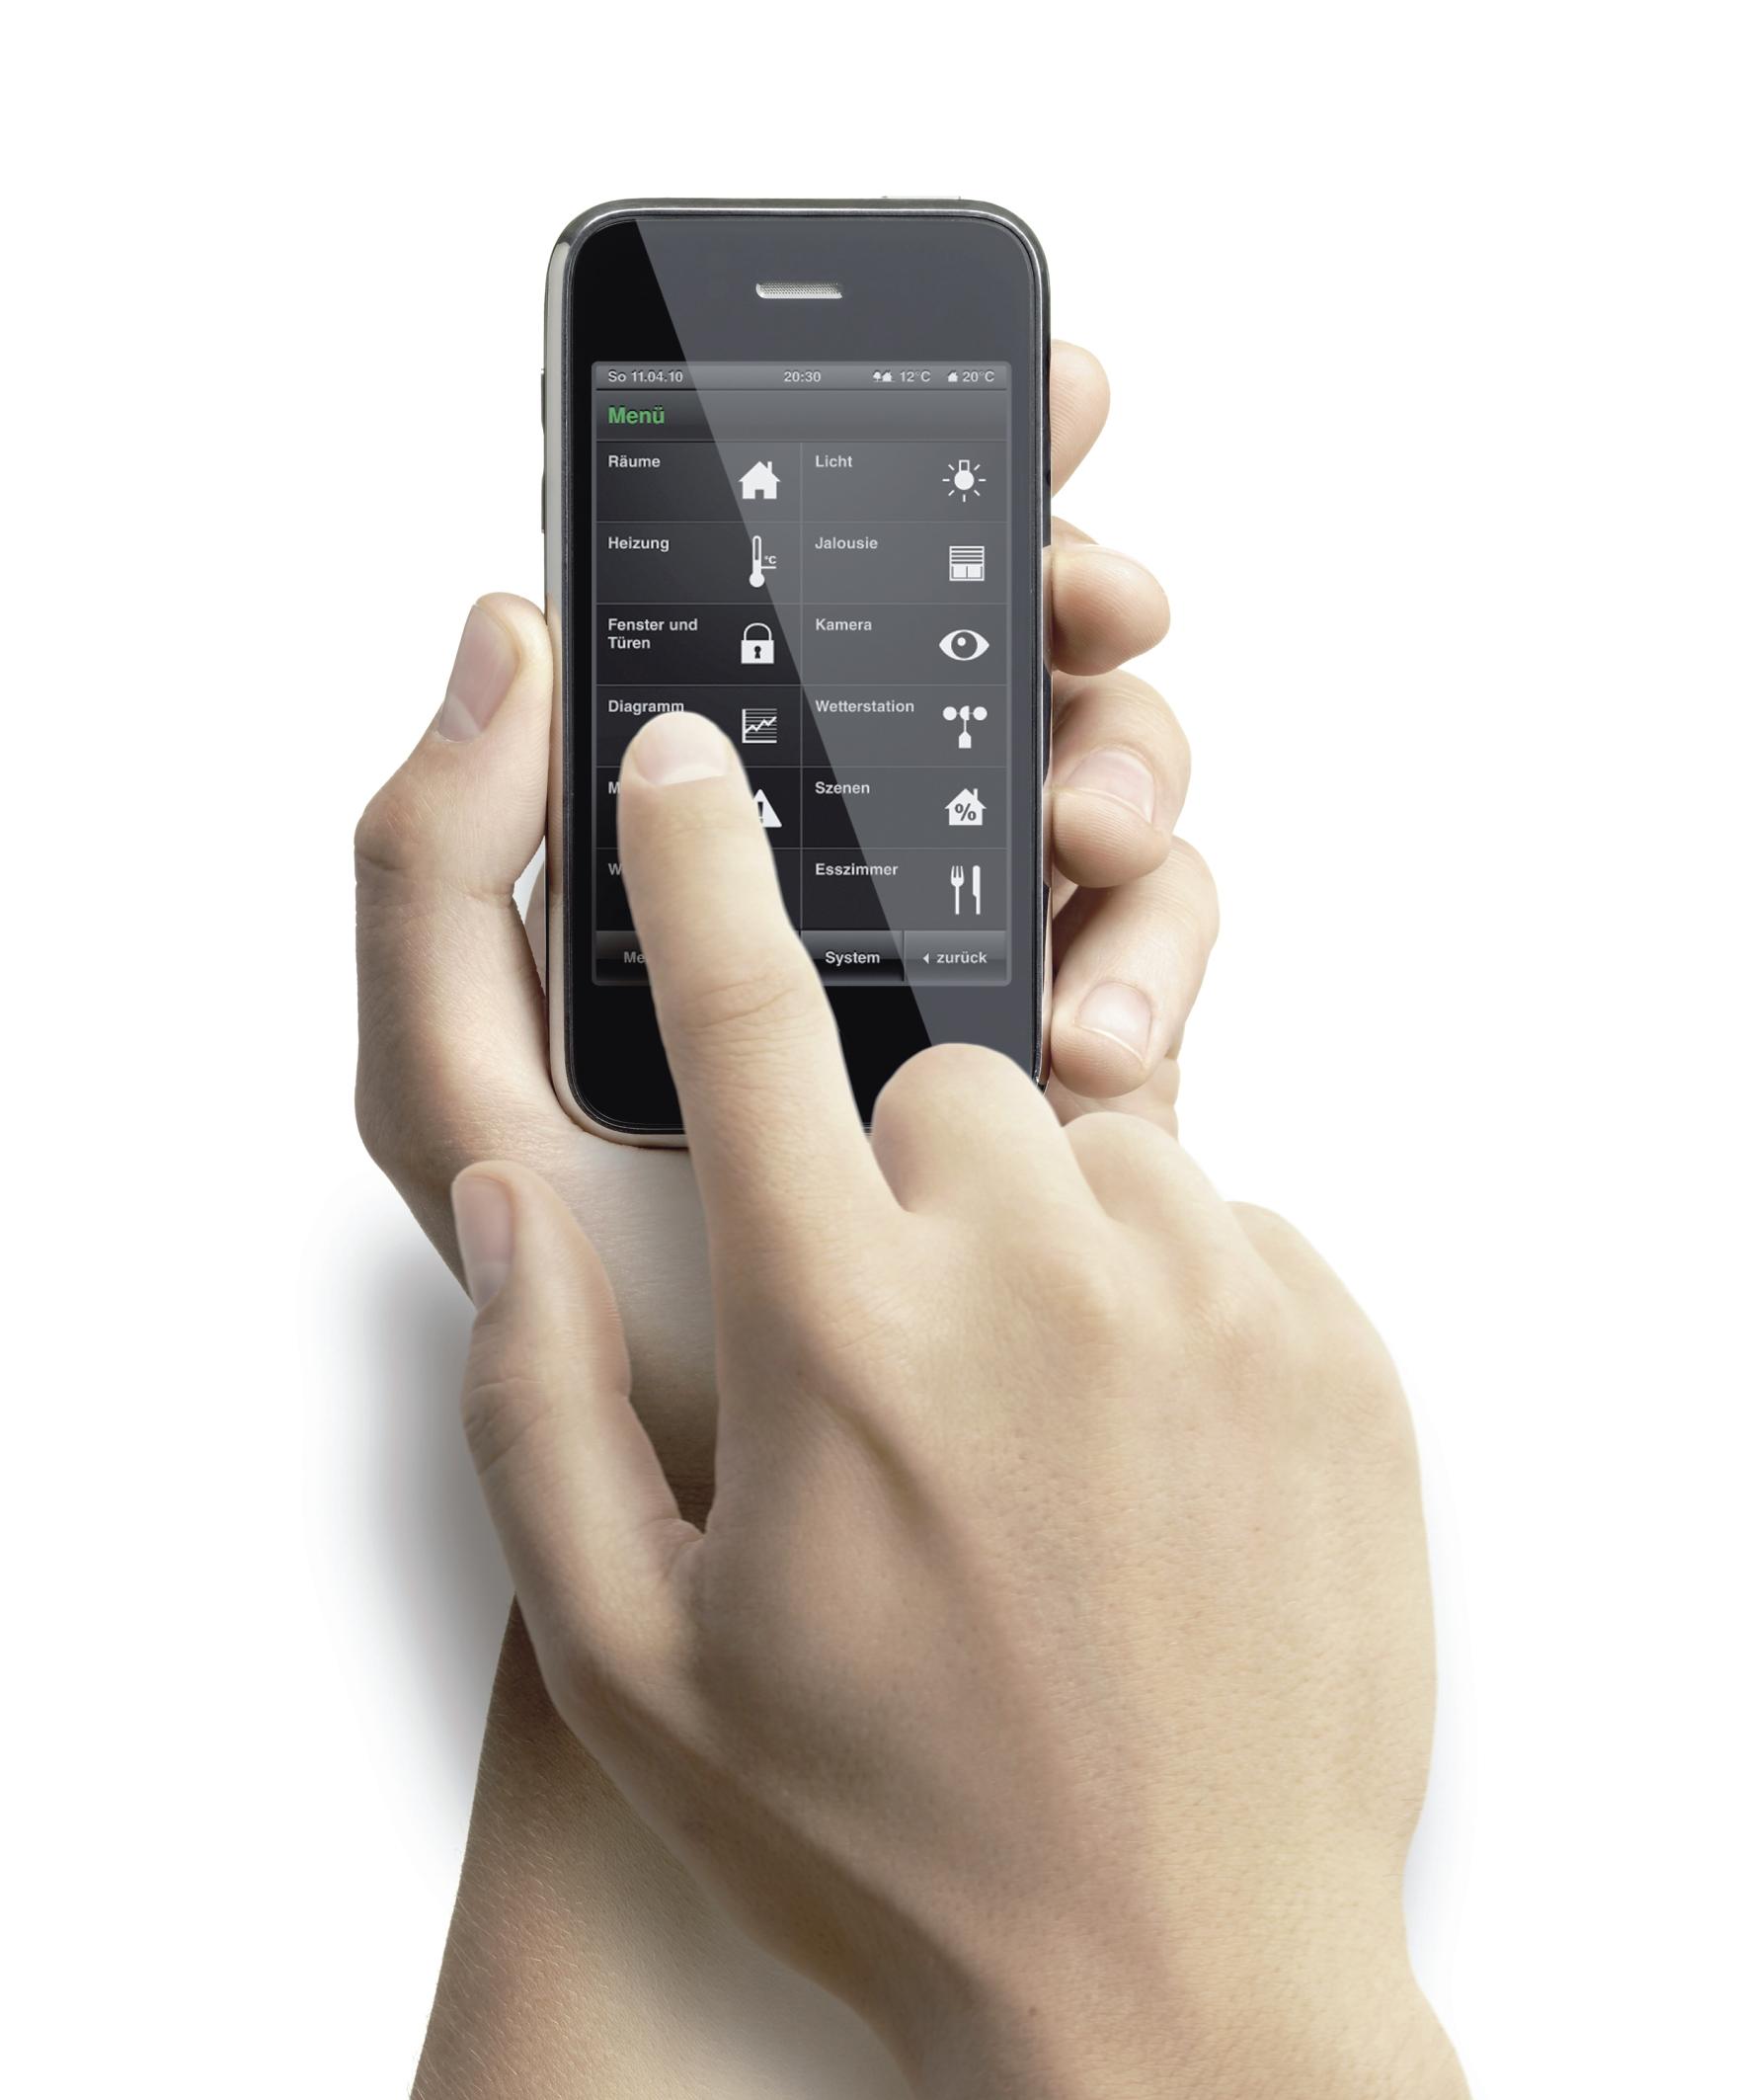 gira steuert geb udetechnik ber iphone ipad und ipod touch. Black Bedroom Furniture Sets. Home Design Ideas